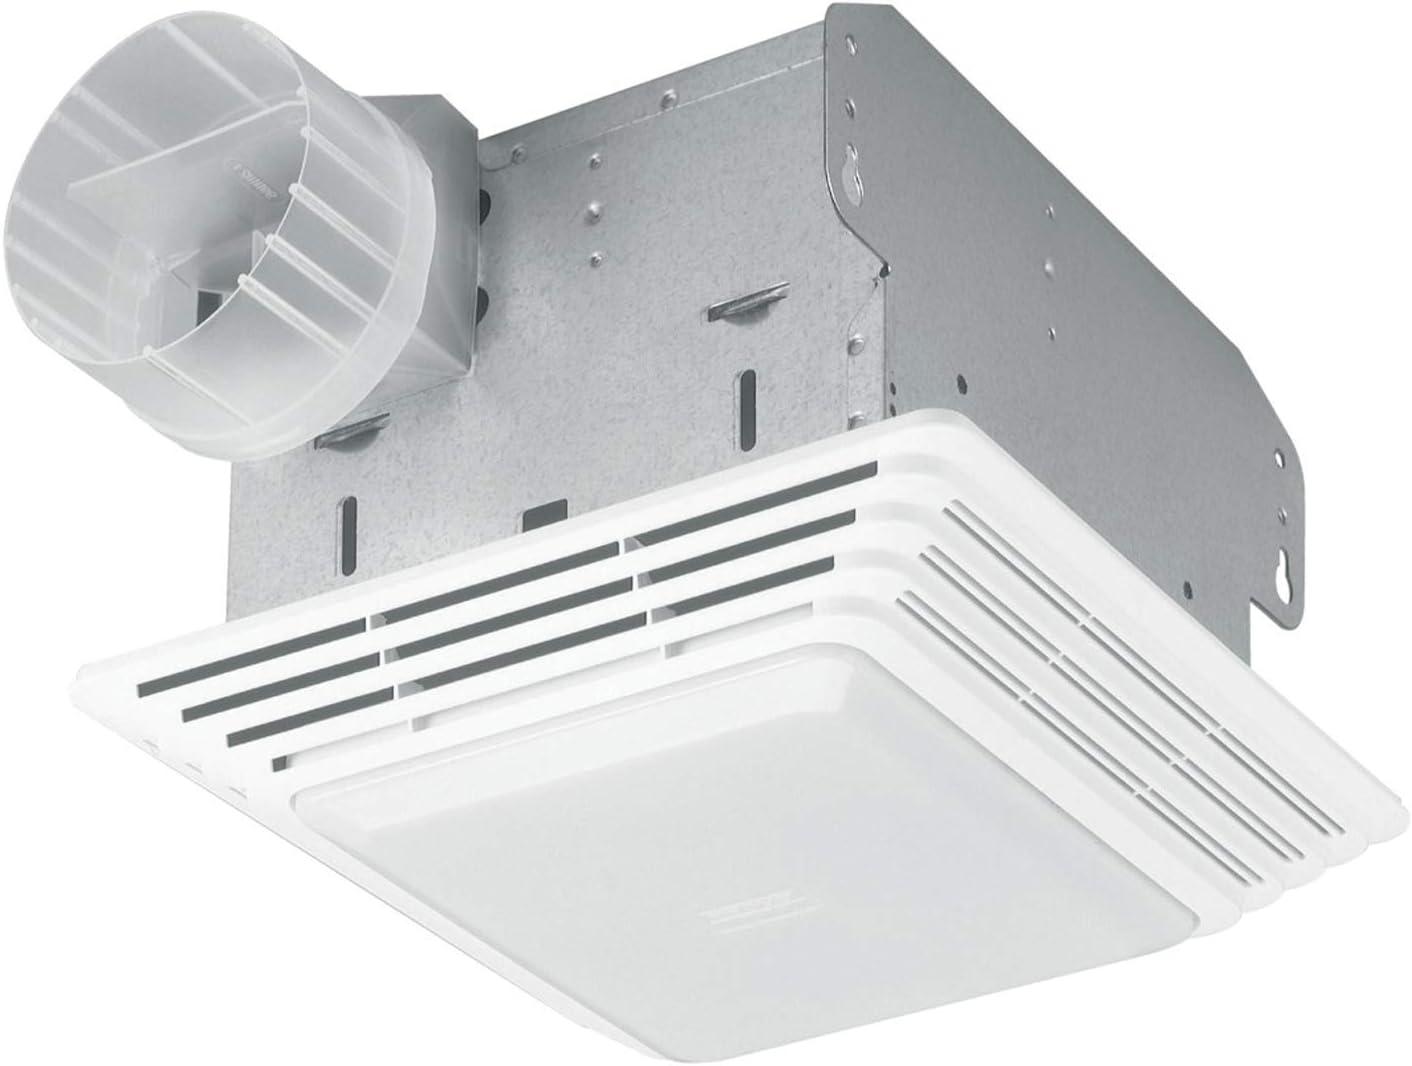 Broan Nutone Hd80l Heavy Duty Ventilation Fan Combo For Bathroom And Home 100 Watt Incandescent Light 80 Cfm Matte White Bathroom Fans Amazon Com